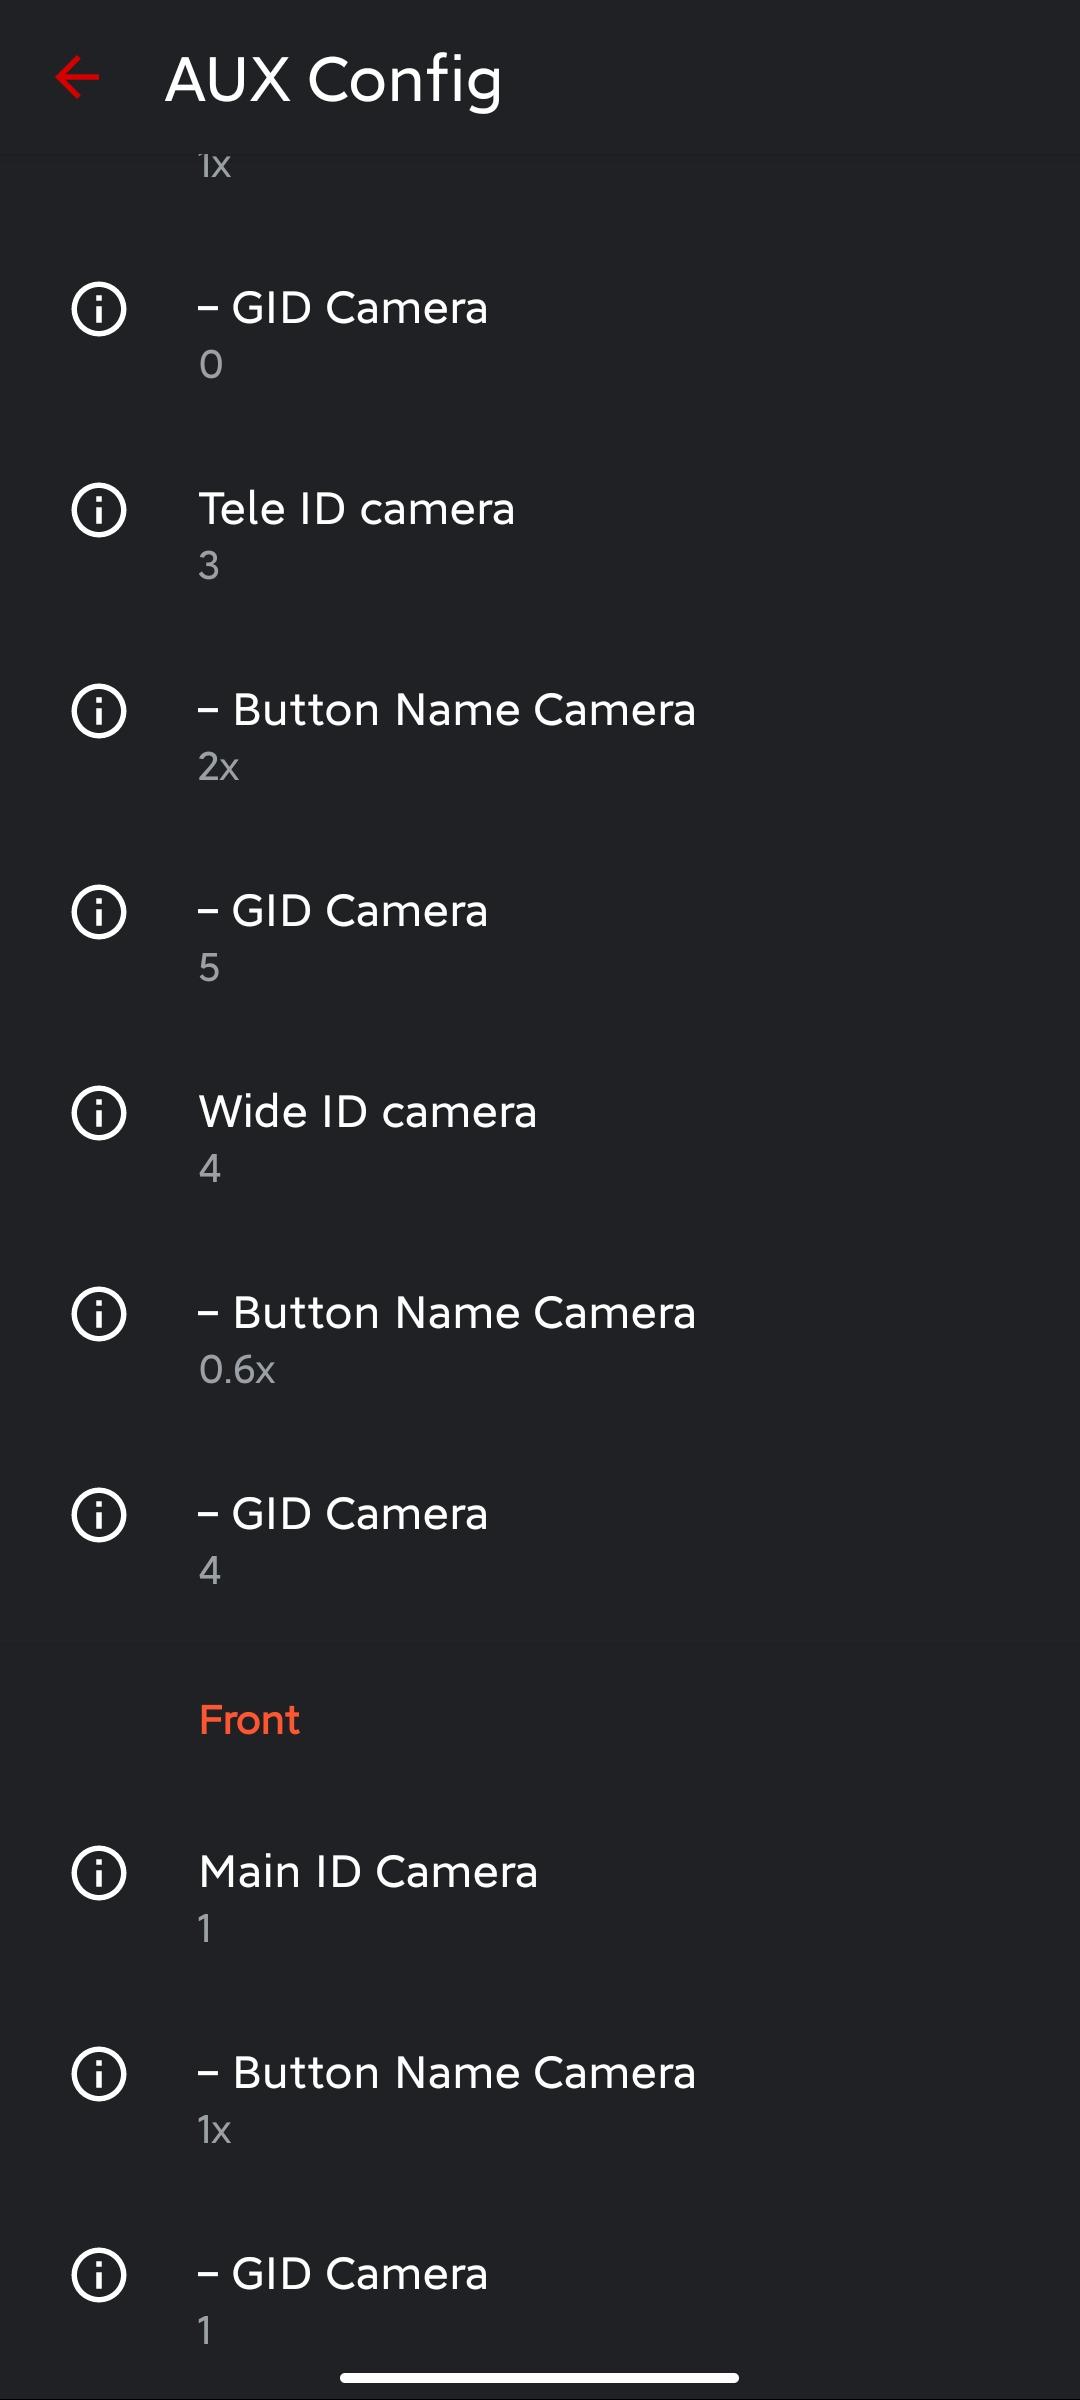 Screenshot_2021-02-13-10-49-26-131_com.google.android.UltraCVM.jpg